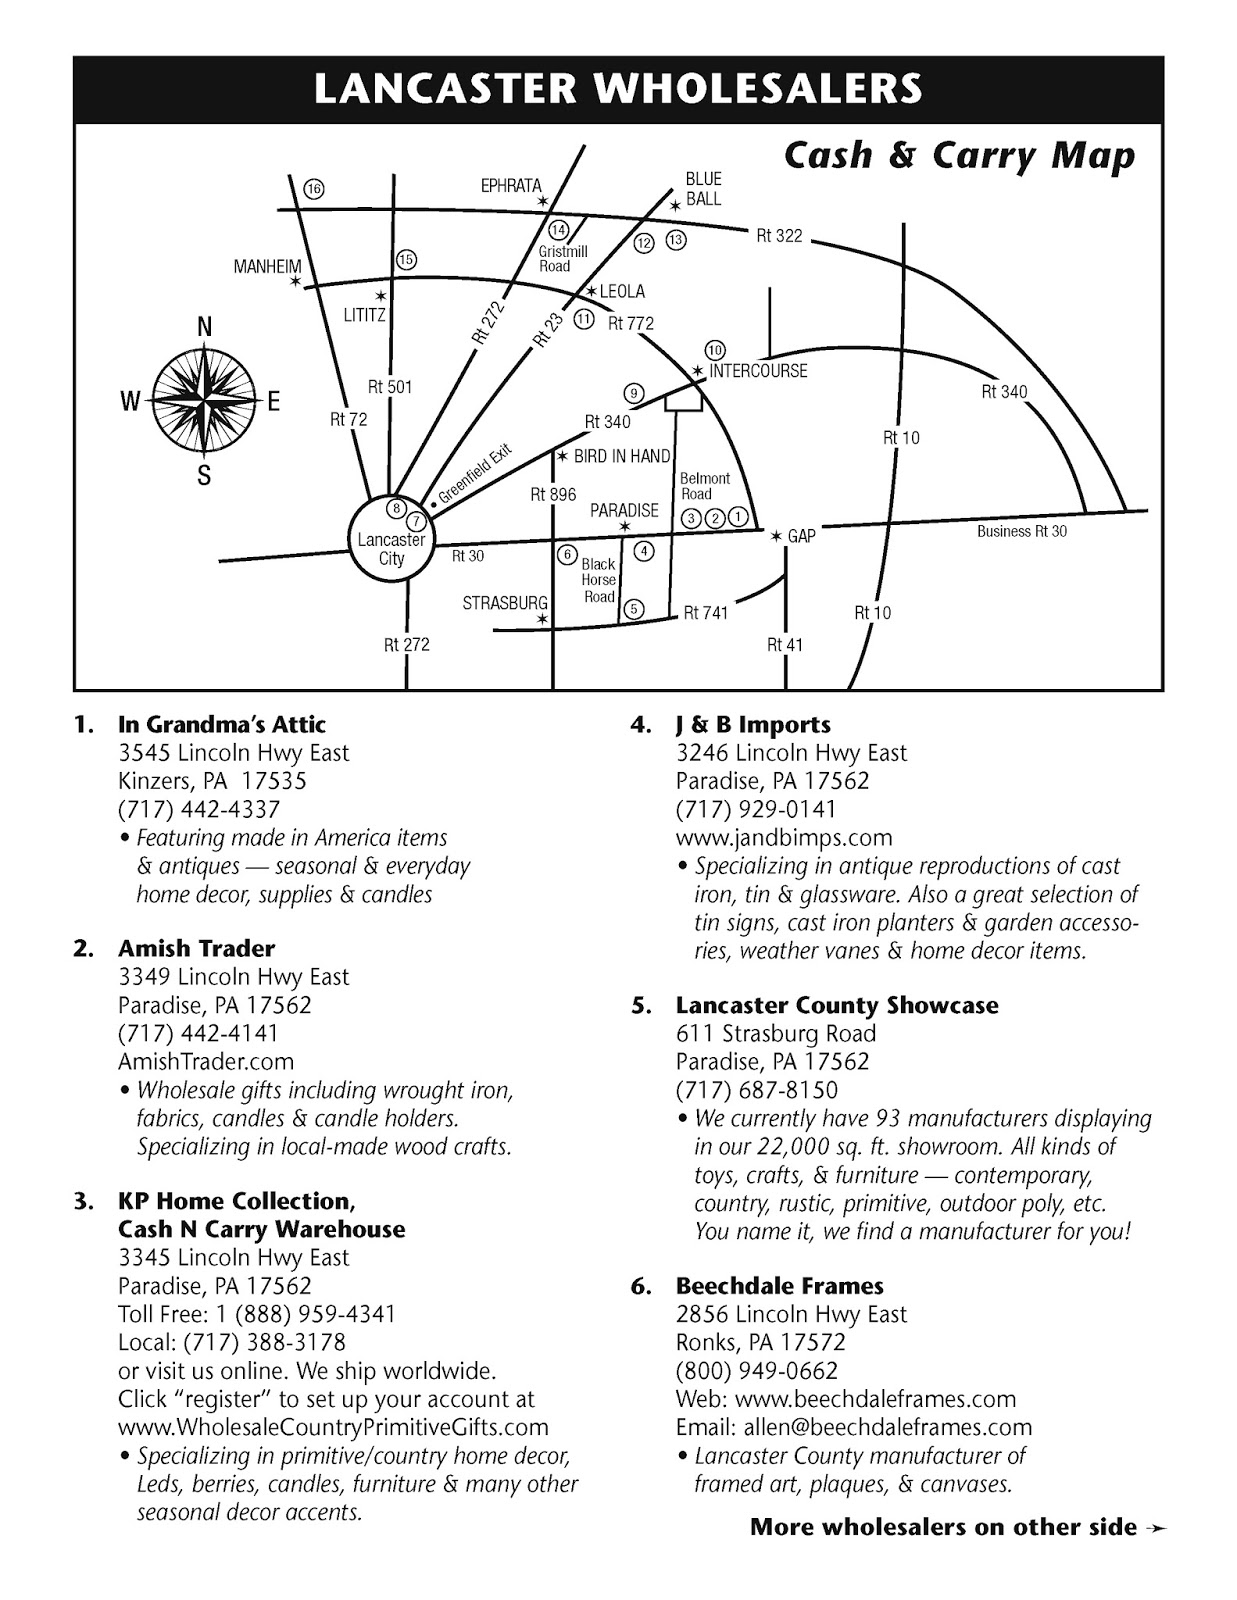 2015 lancaster wholesale map update